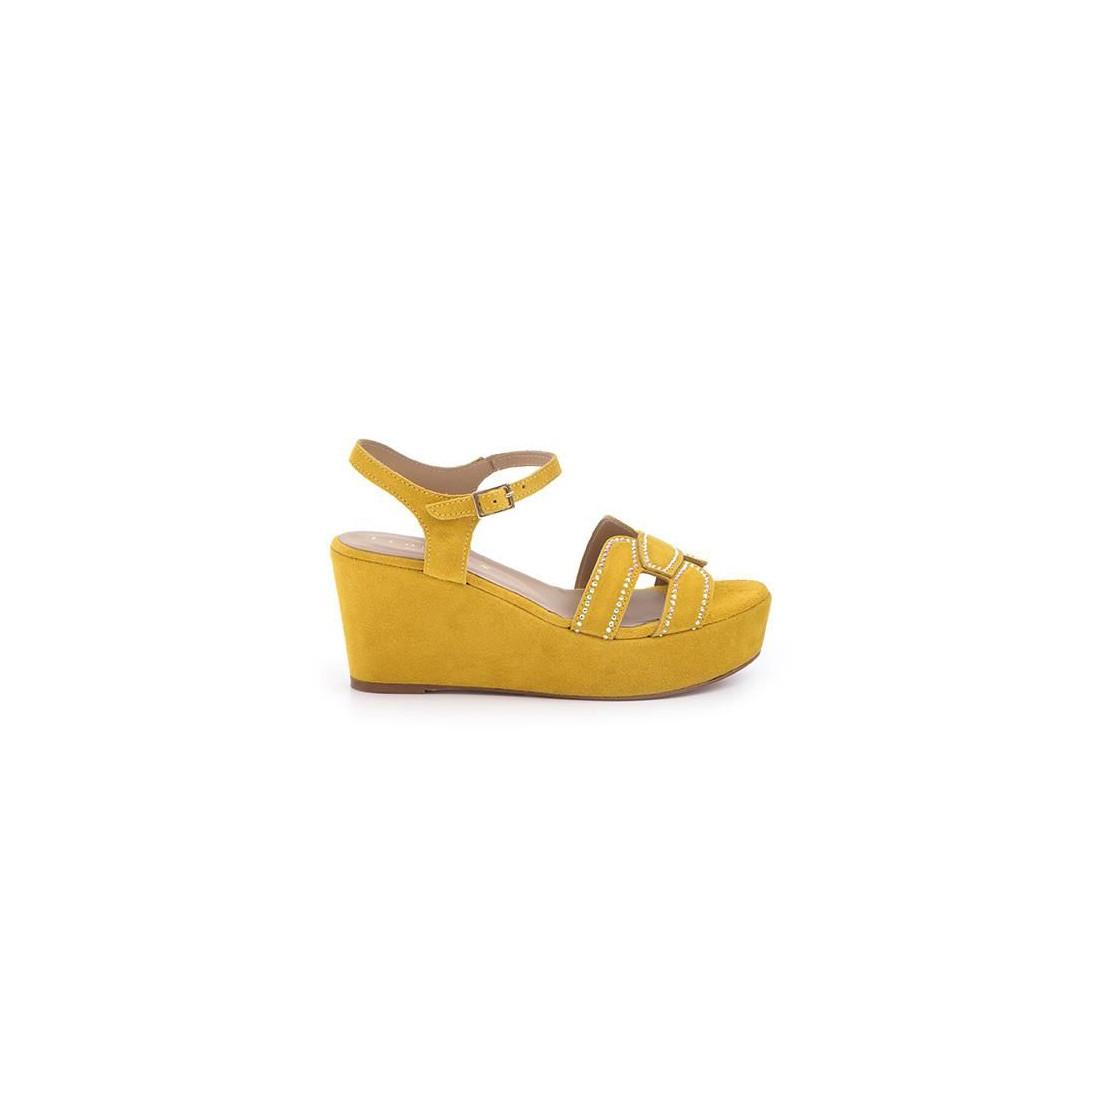 sandals woman fiorina  s463 336kaleda  3370